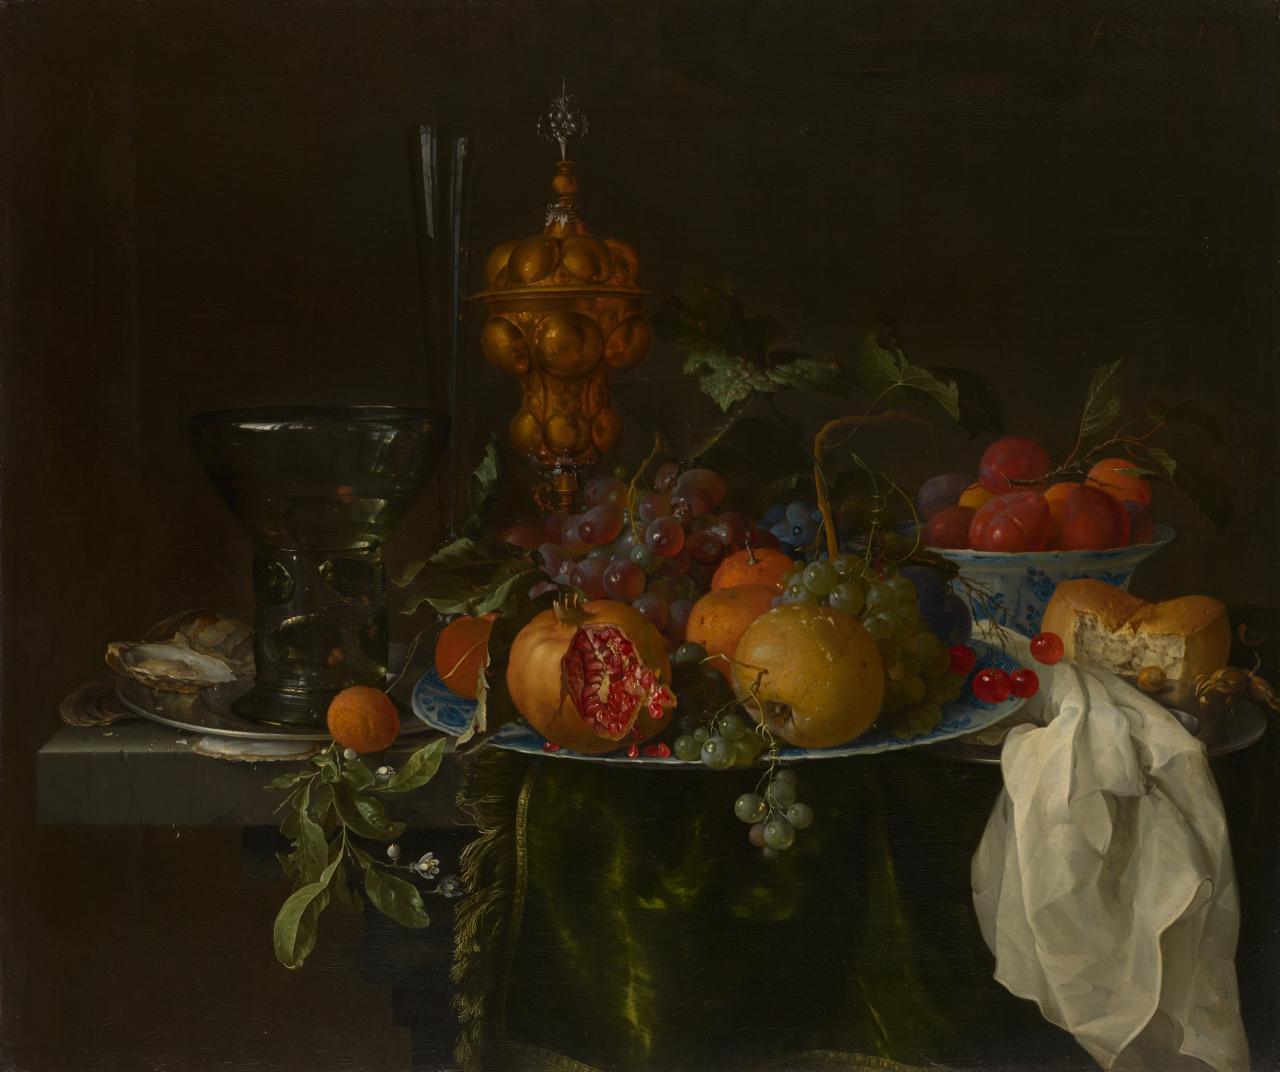 Still life with fruit | Jan Davidsz. de HEEM | NGV | View Work